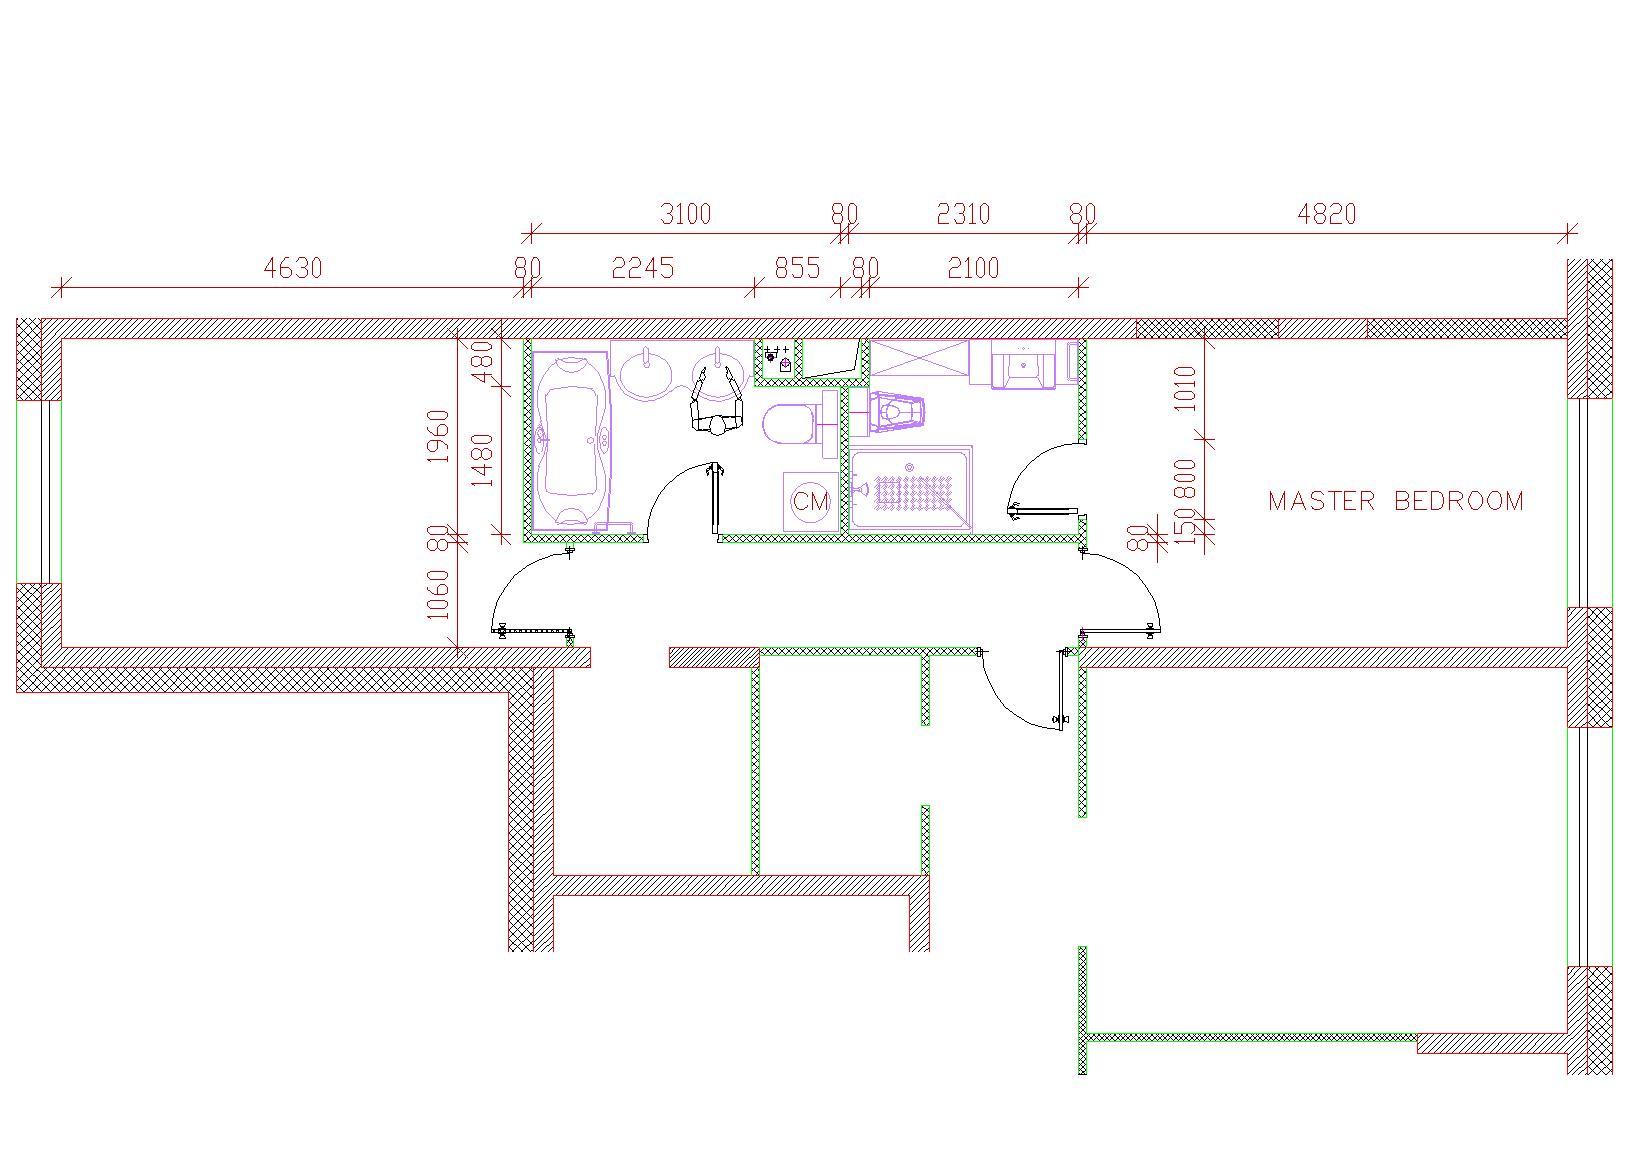 Дизайн-проект для ванных комнат фото f_9175ba0dfe5ed74e.jpg